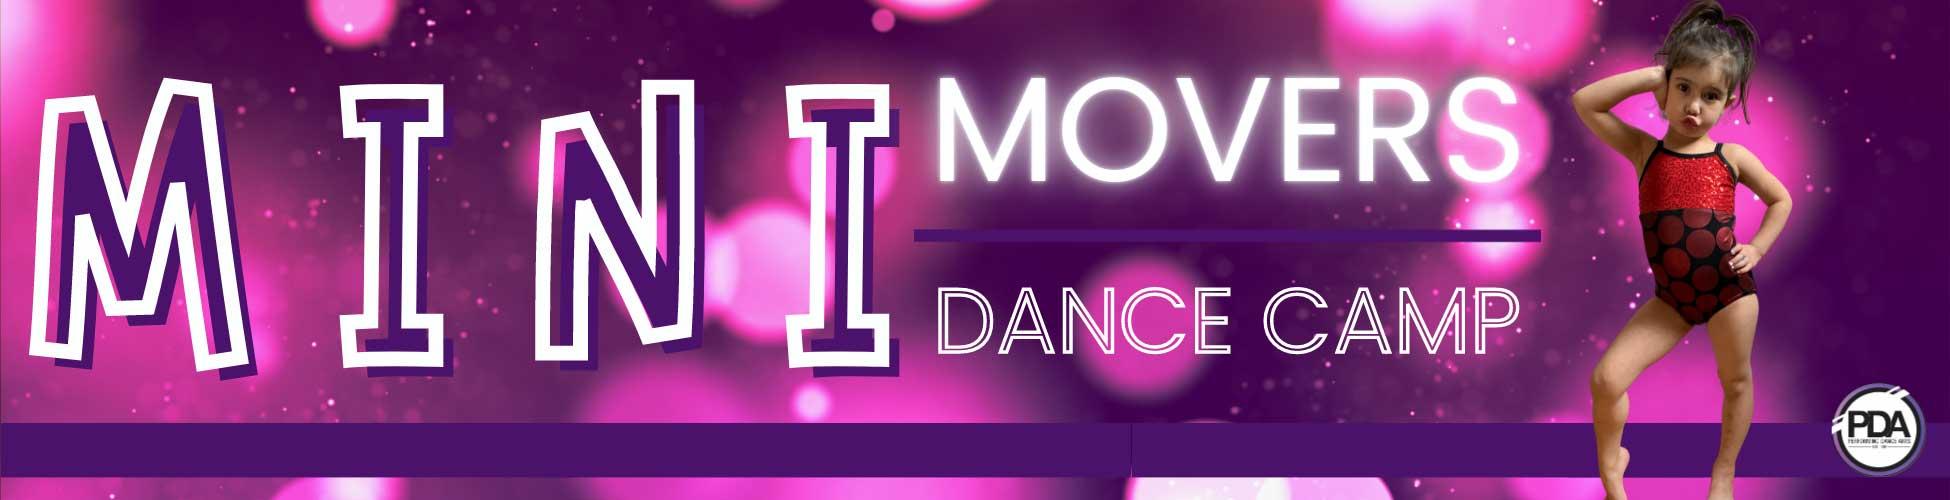 Mini Movers Dance Camp